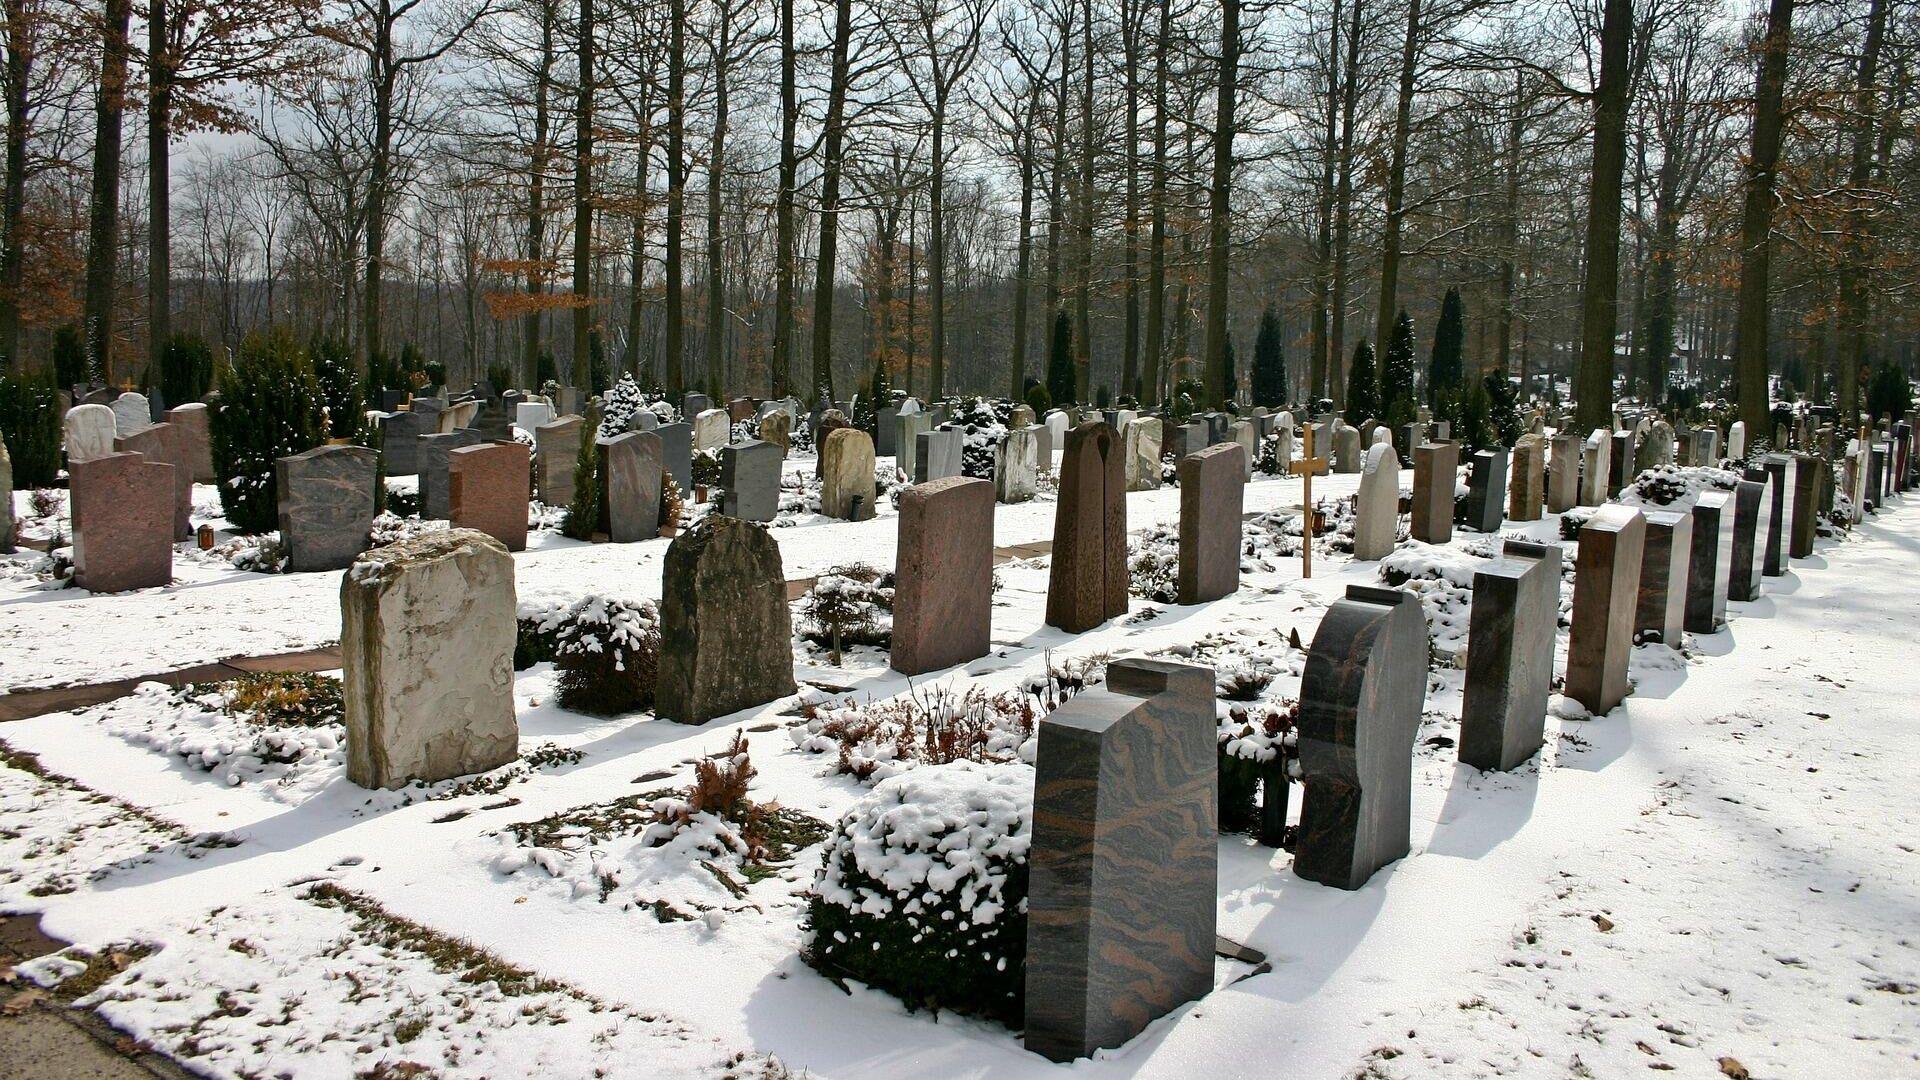 Friedhof (Symbolbild) - SNA, 1920, 24.02.2021